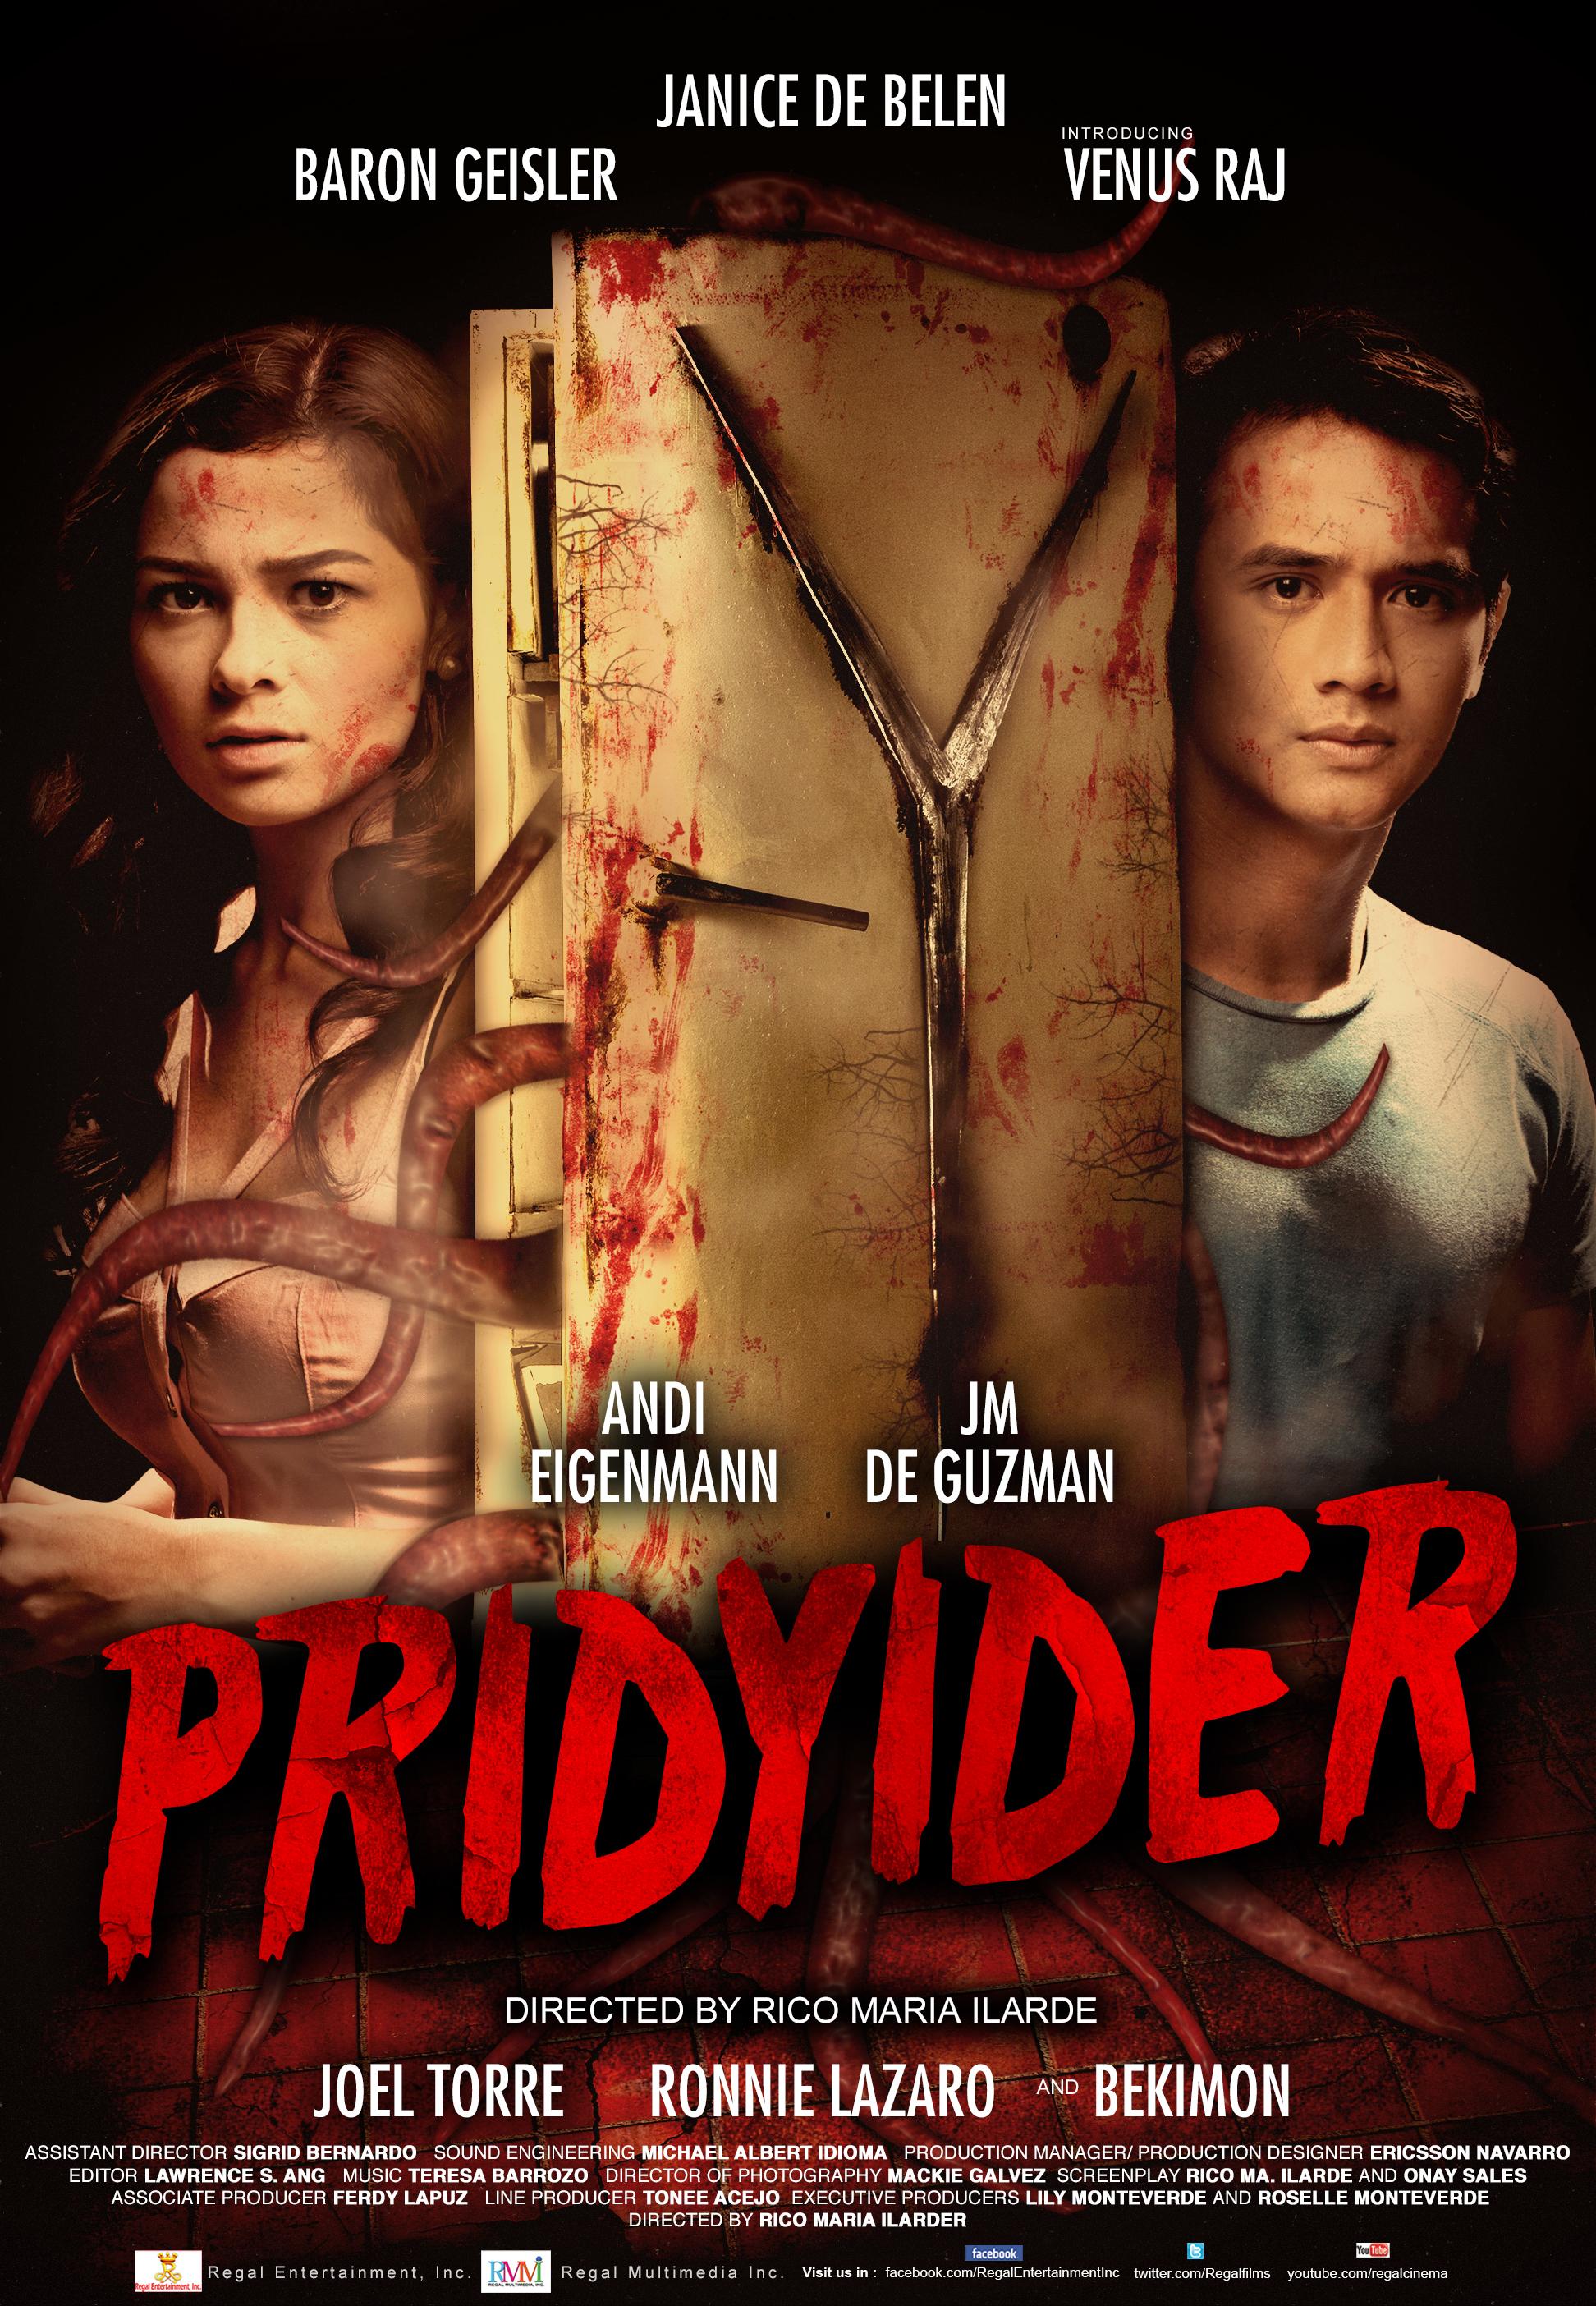 NYAFF '13: 'The Fridge' Movie Review (aka Pridyider)